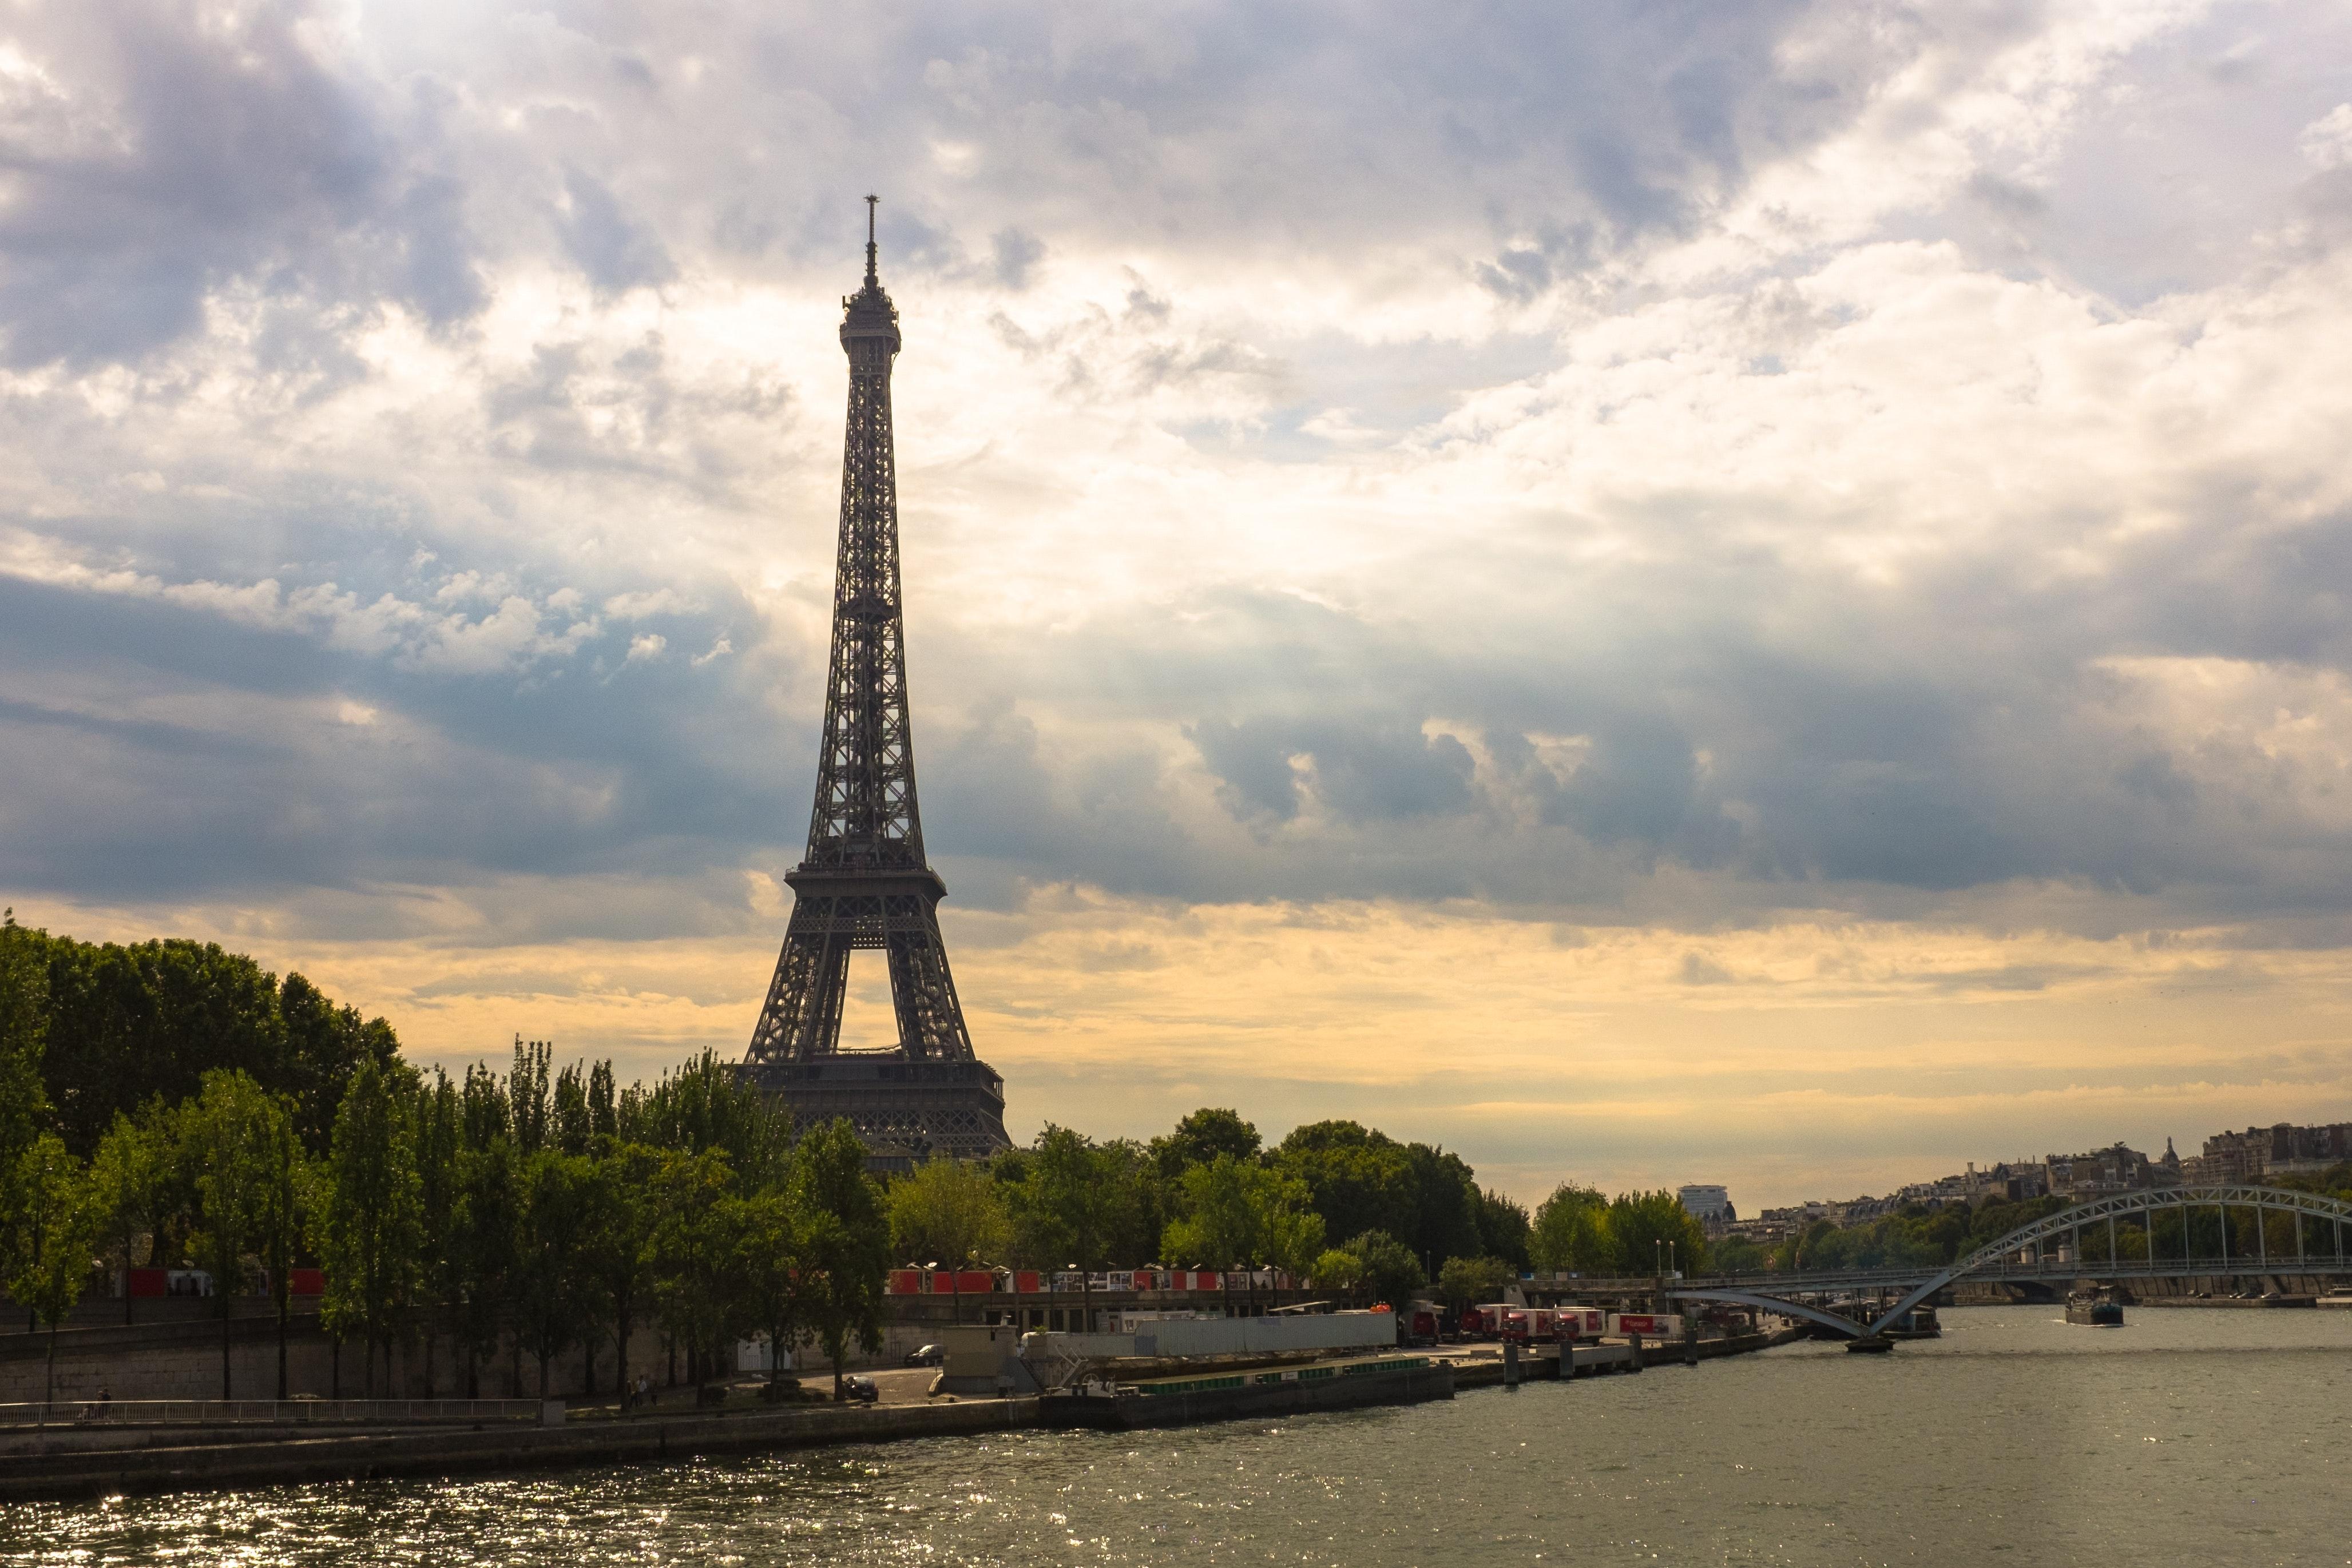 Eiffel tower during daytime photo